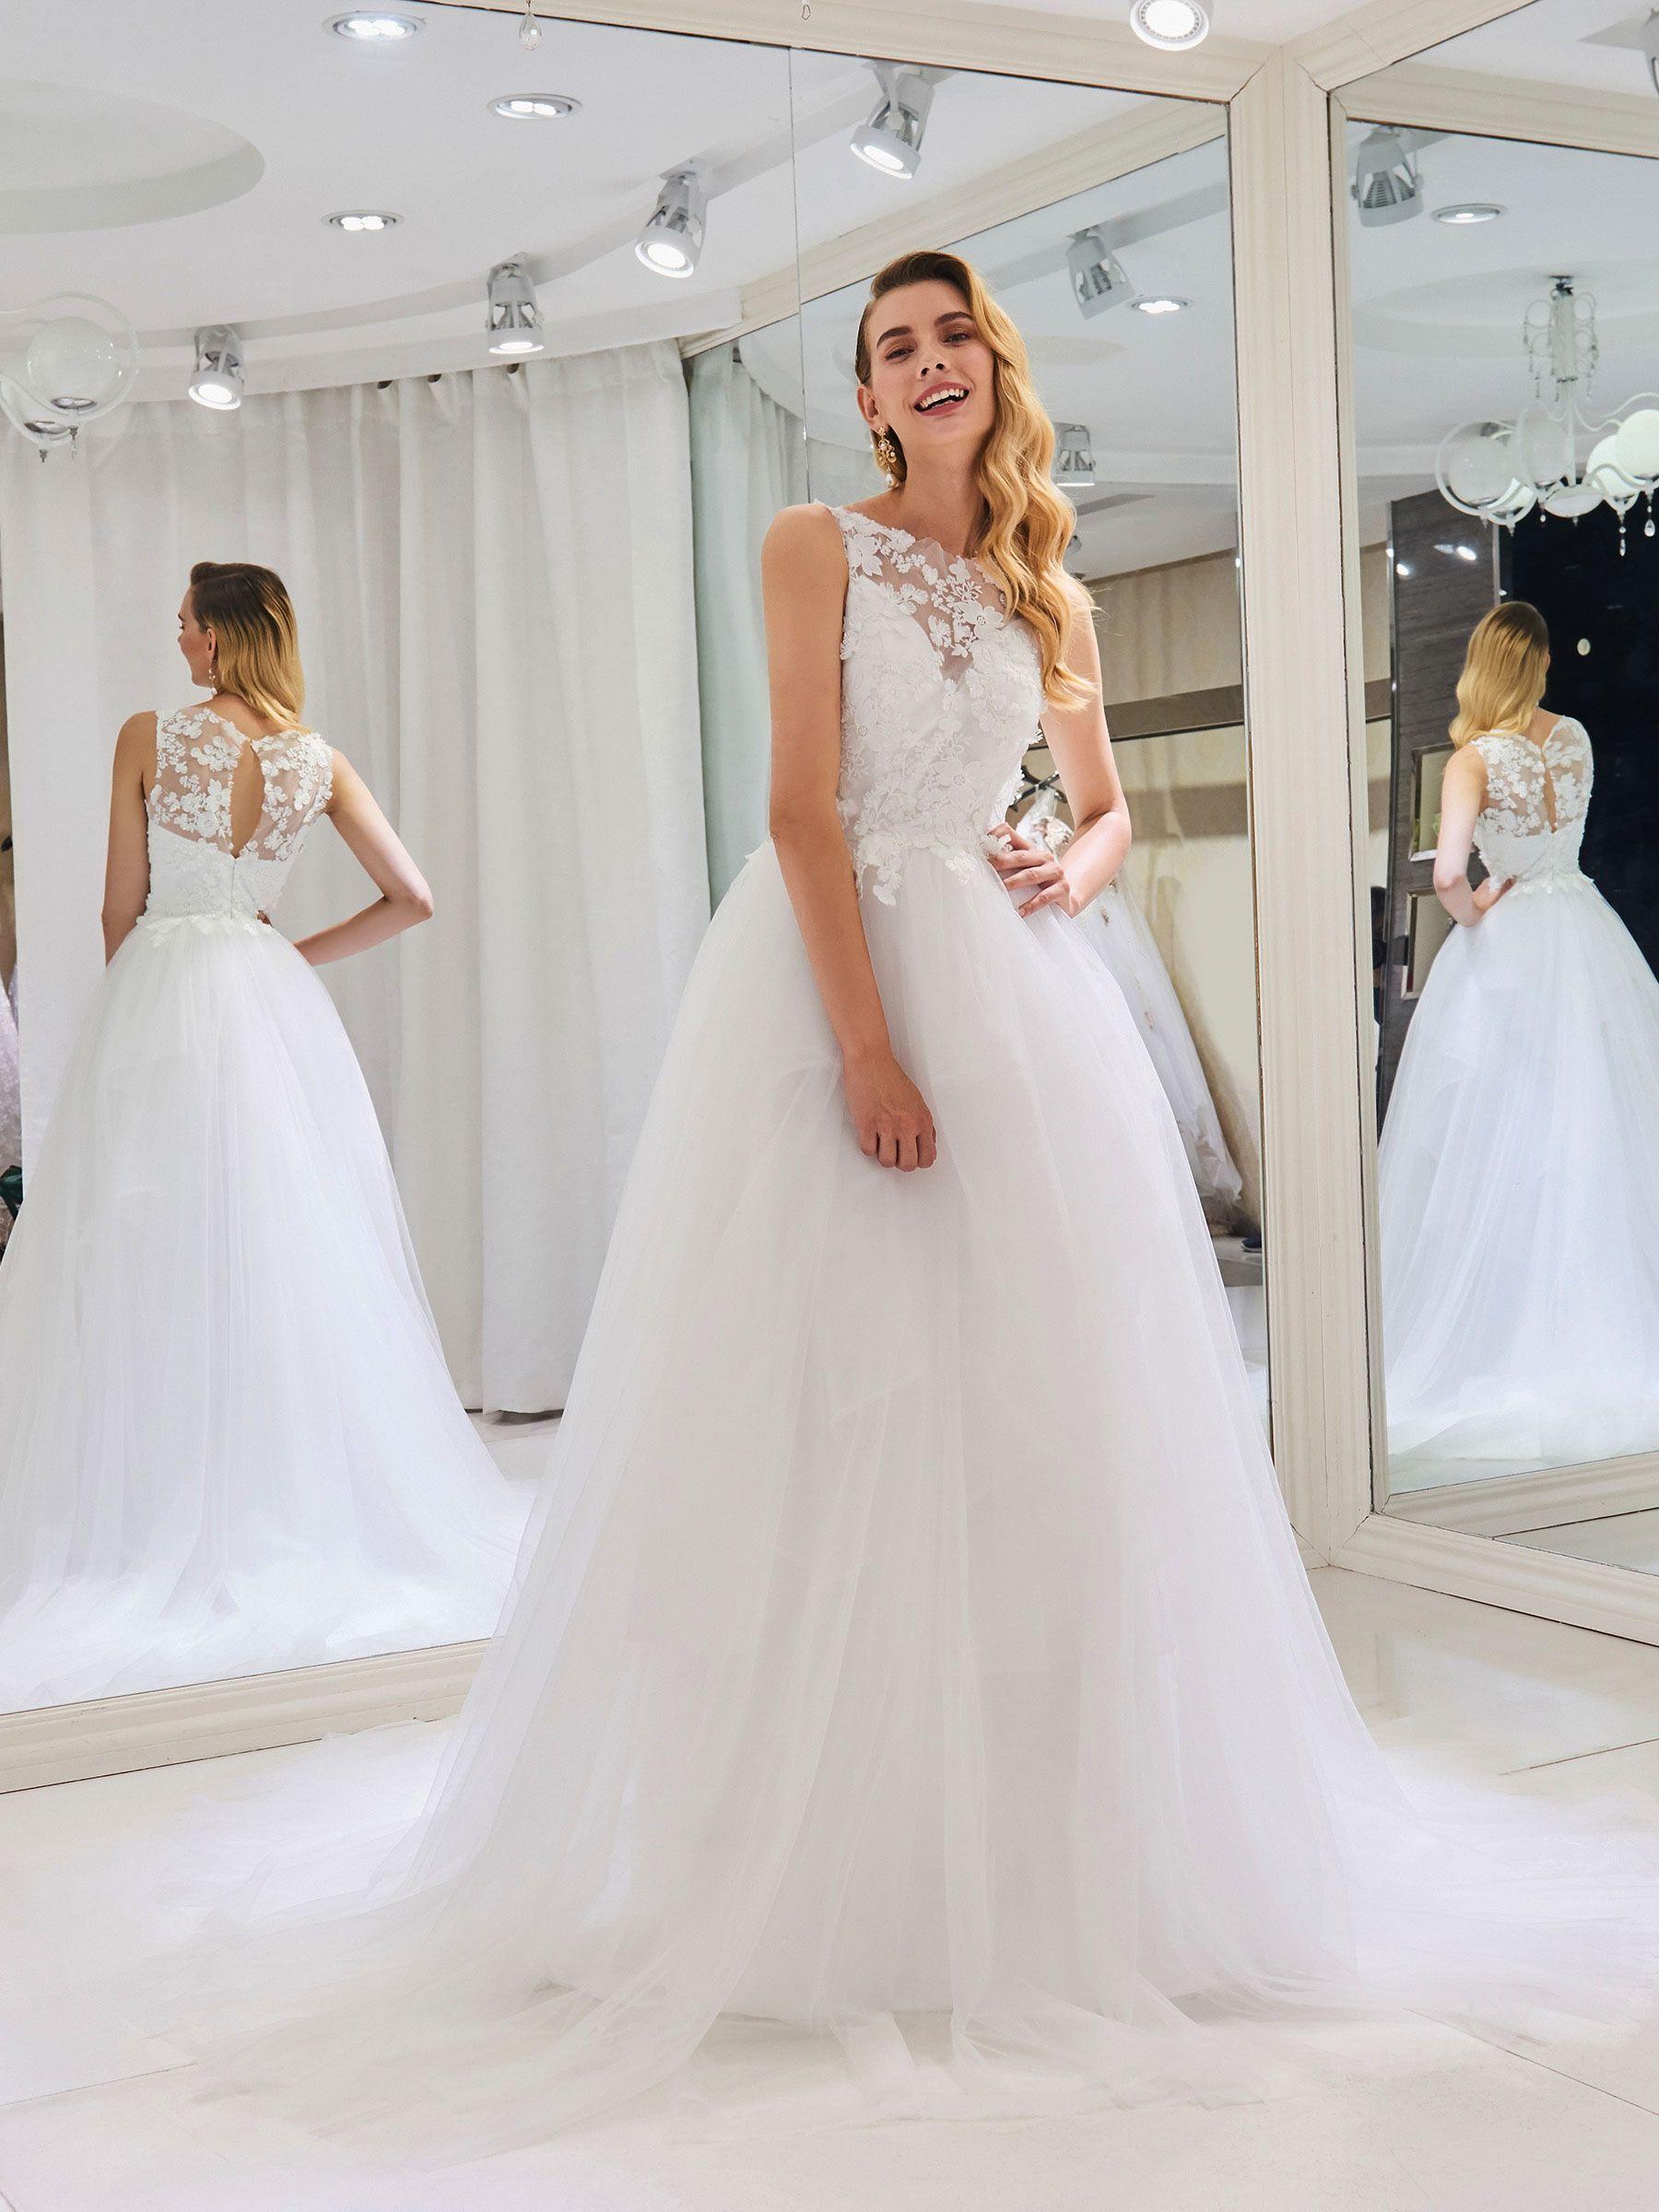 Lace ball gown wedding dresses  Lace Appliques Ball Gown Wedding Dress  Wedding Lovinu  Pinterest